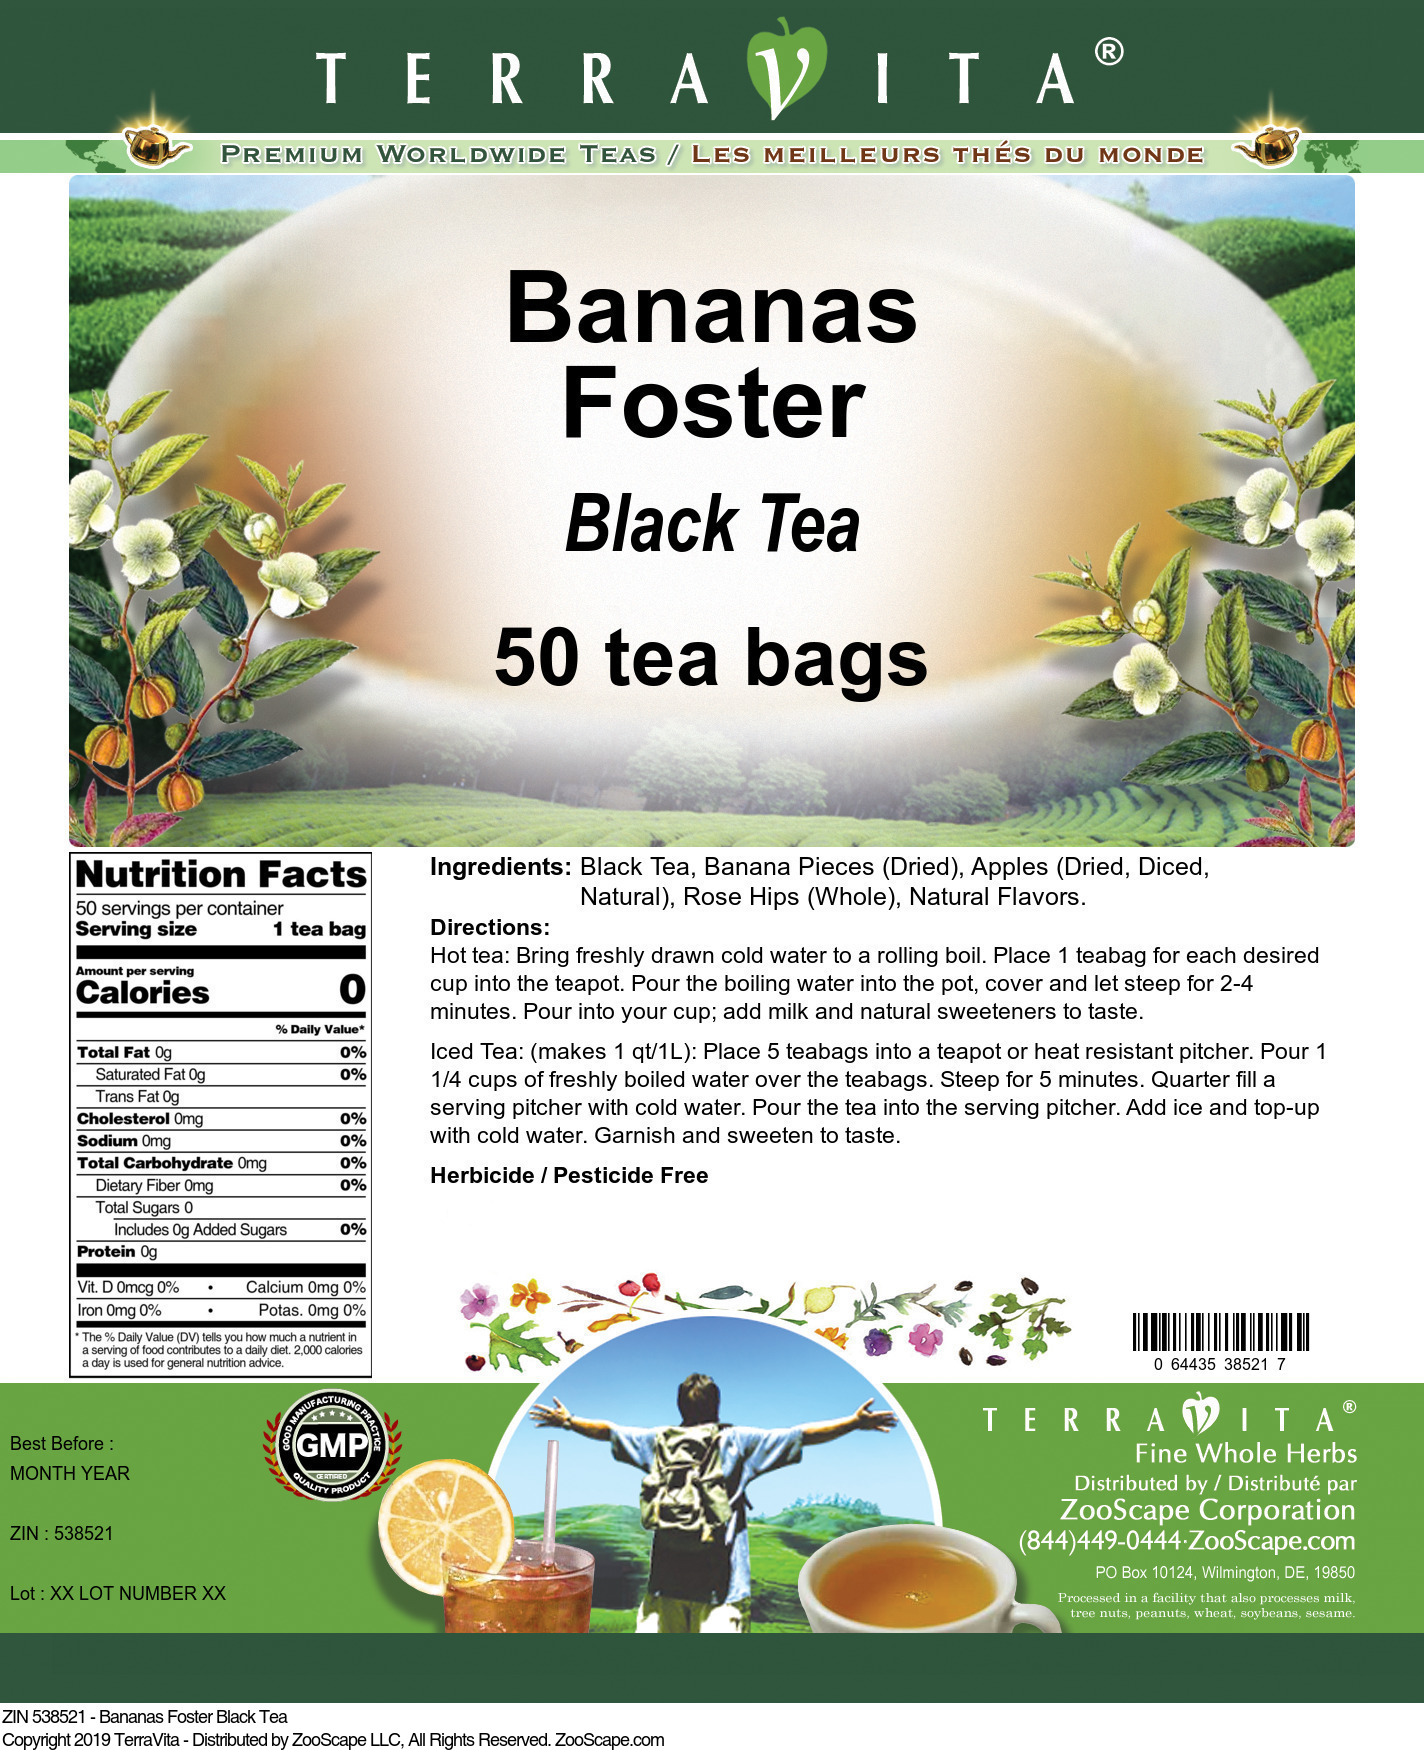 Bananas Foster Black Tea